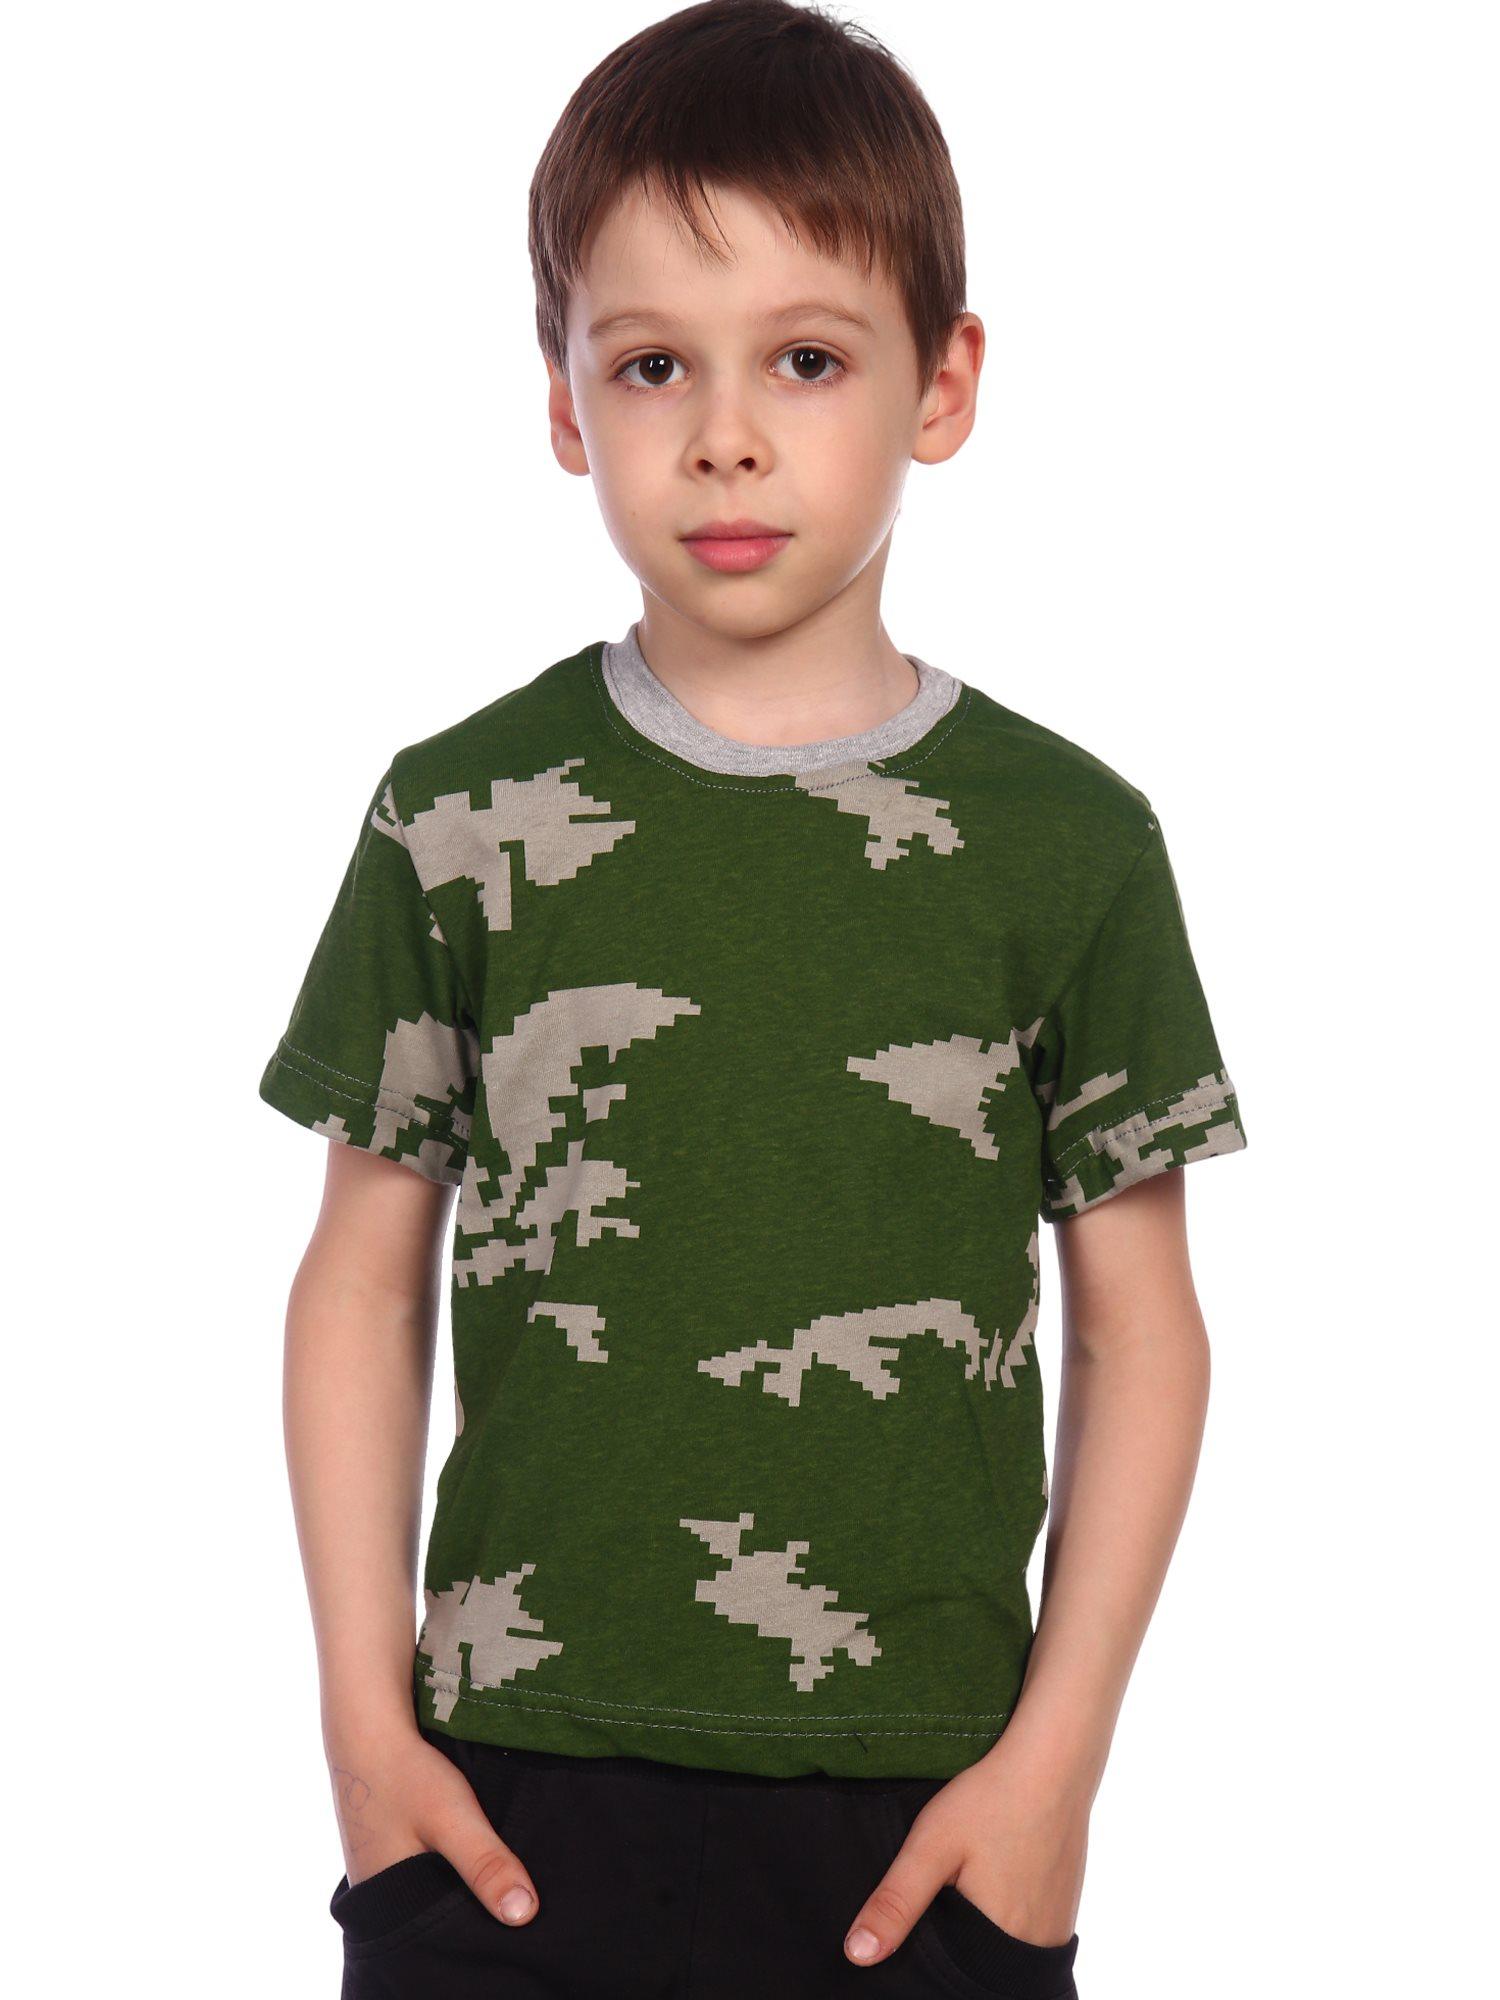 футболка детская (кулирка) граница